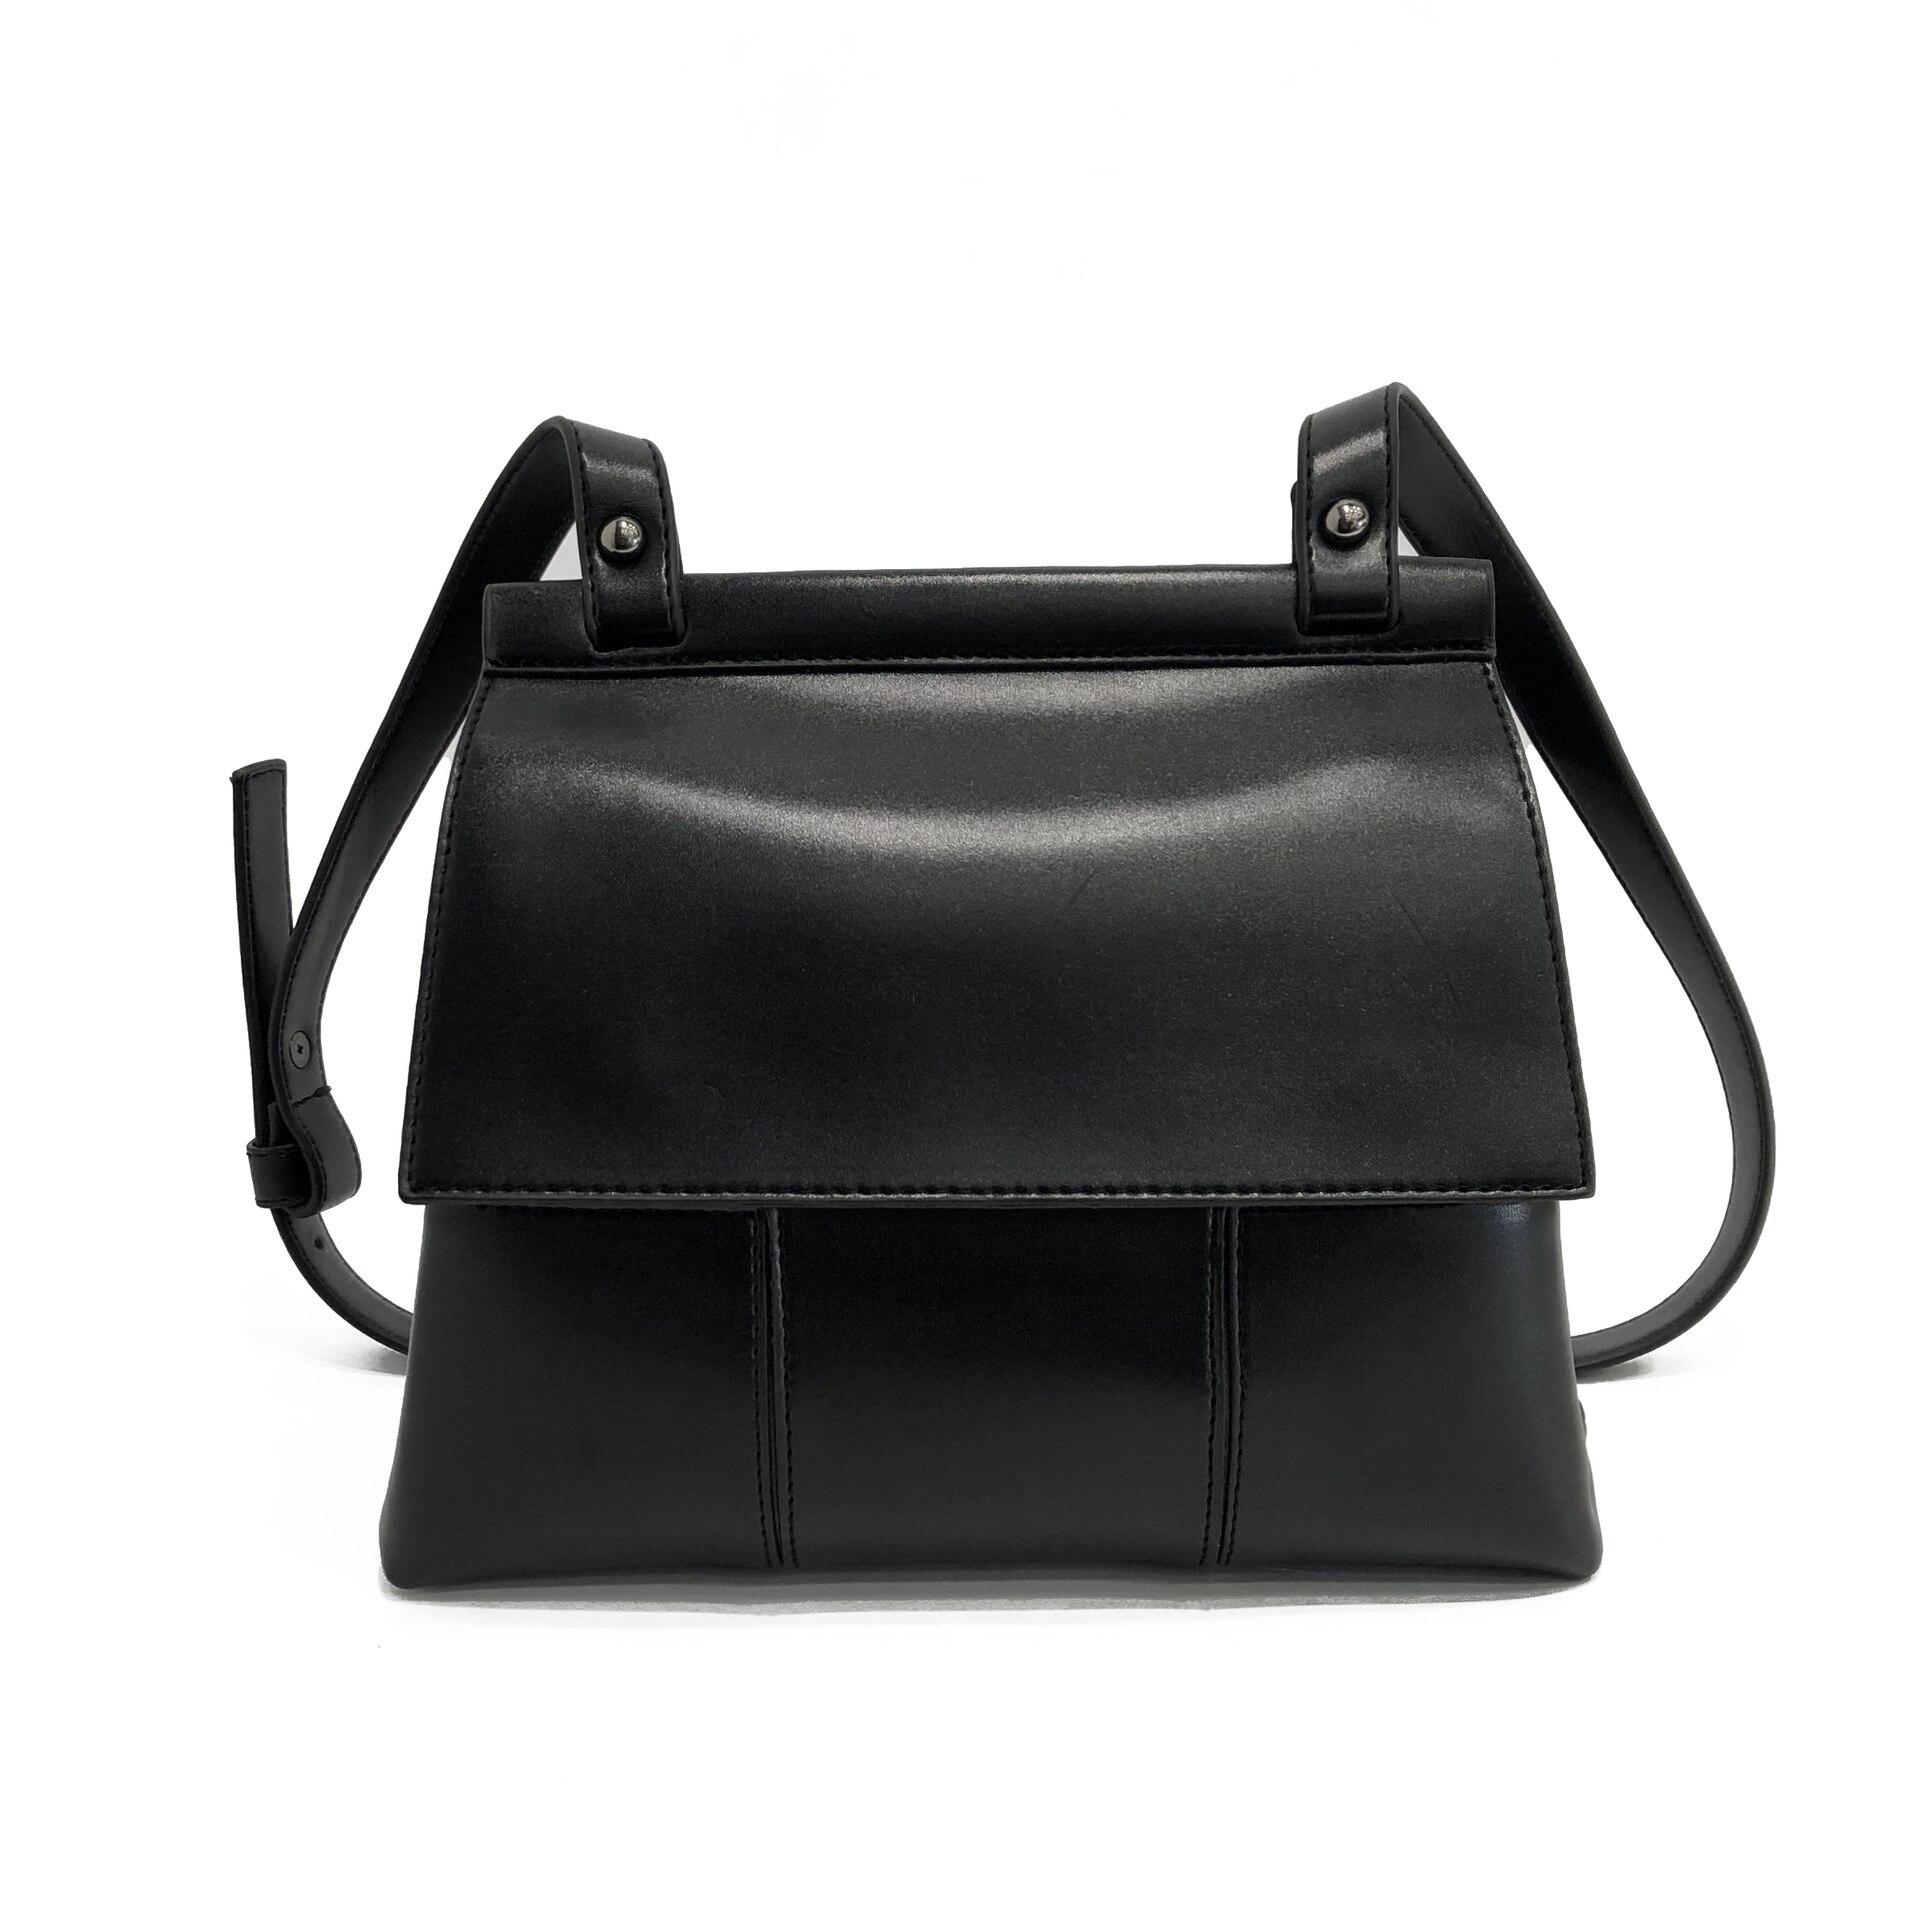 Luxury Handbags Women Bags Designer Sale Flap Cross-section Messenger Bag 2018 New Spring Bale Korean Shoulder Tote Leisure Pu